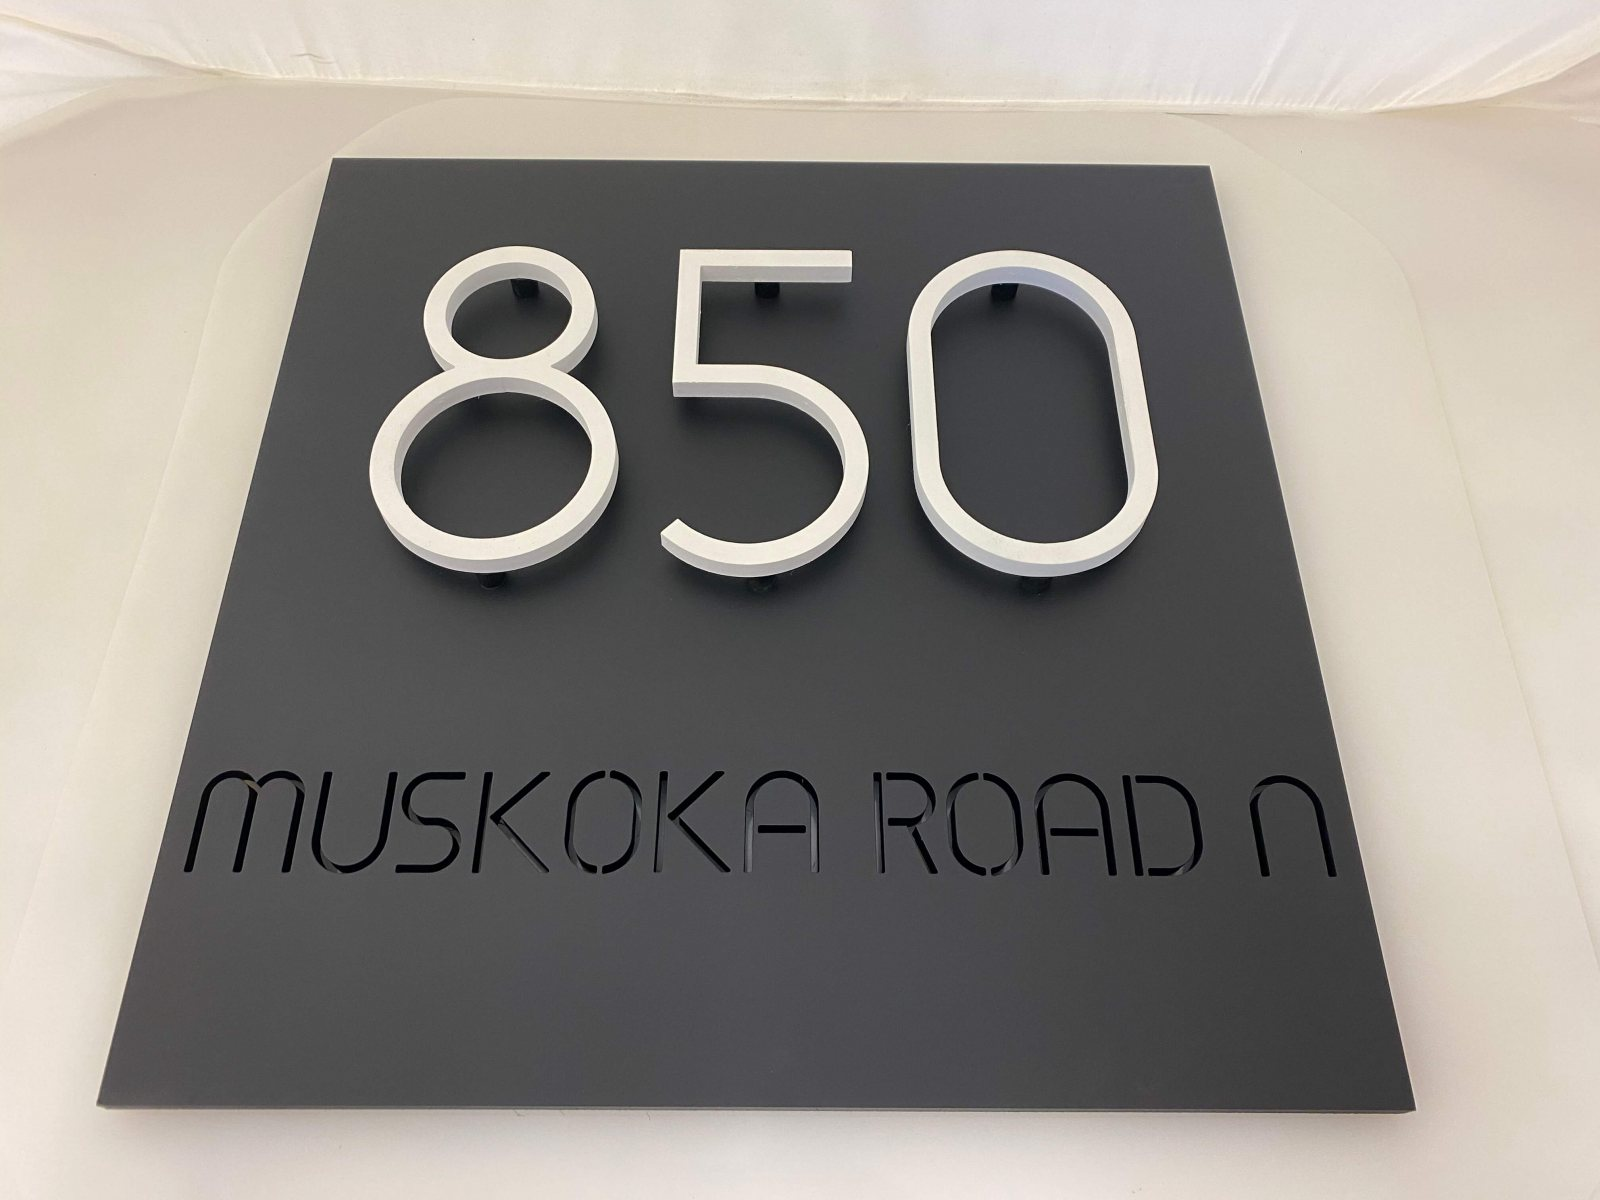 Vivid House Number | Residential Room Numbers | 850 Muskoka Road N | White Finish | Custom Black Plate